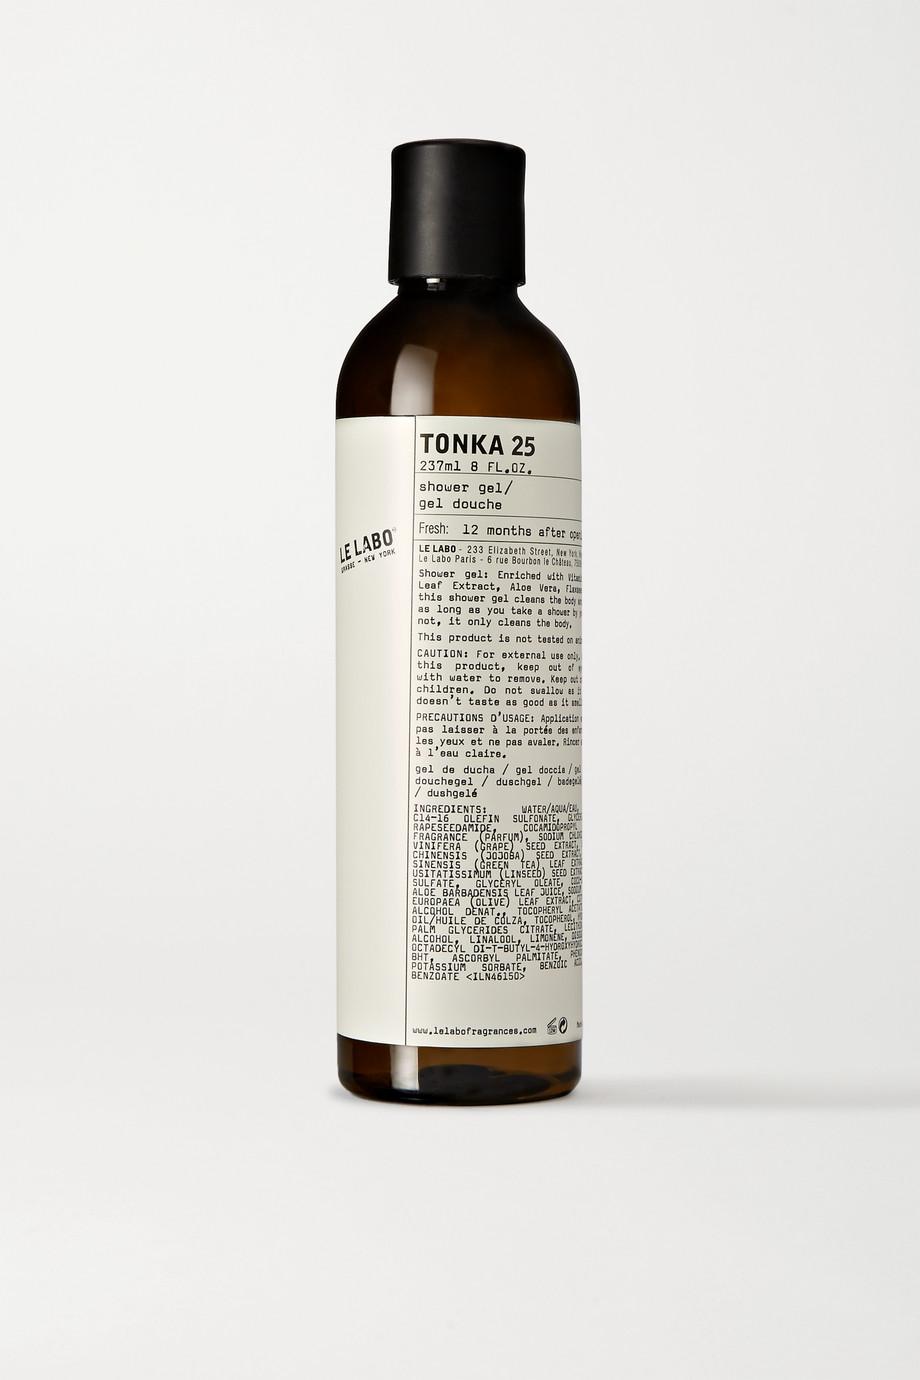 Le Labo Tonka 25 Shower Gel, 237ml